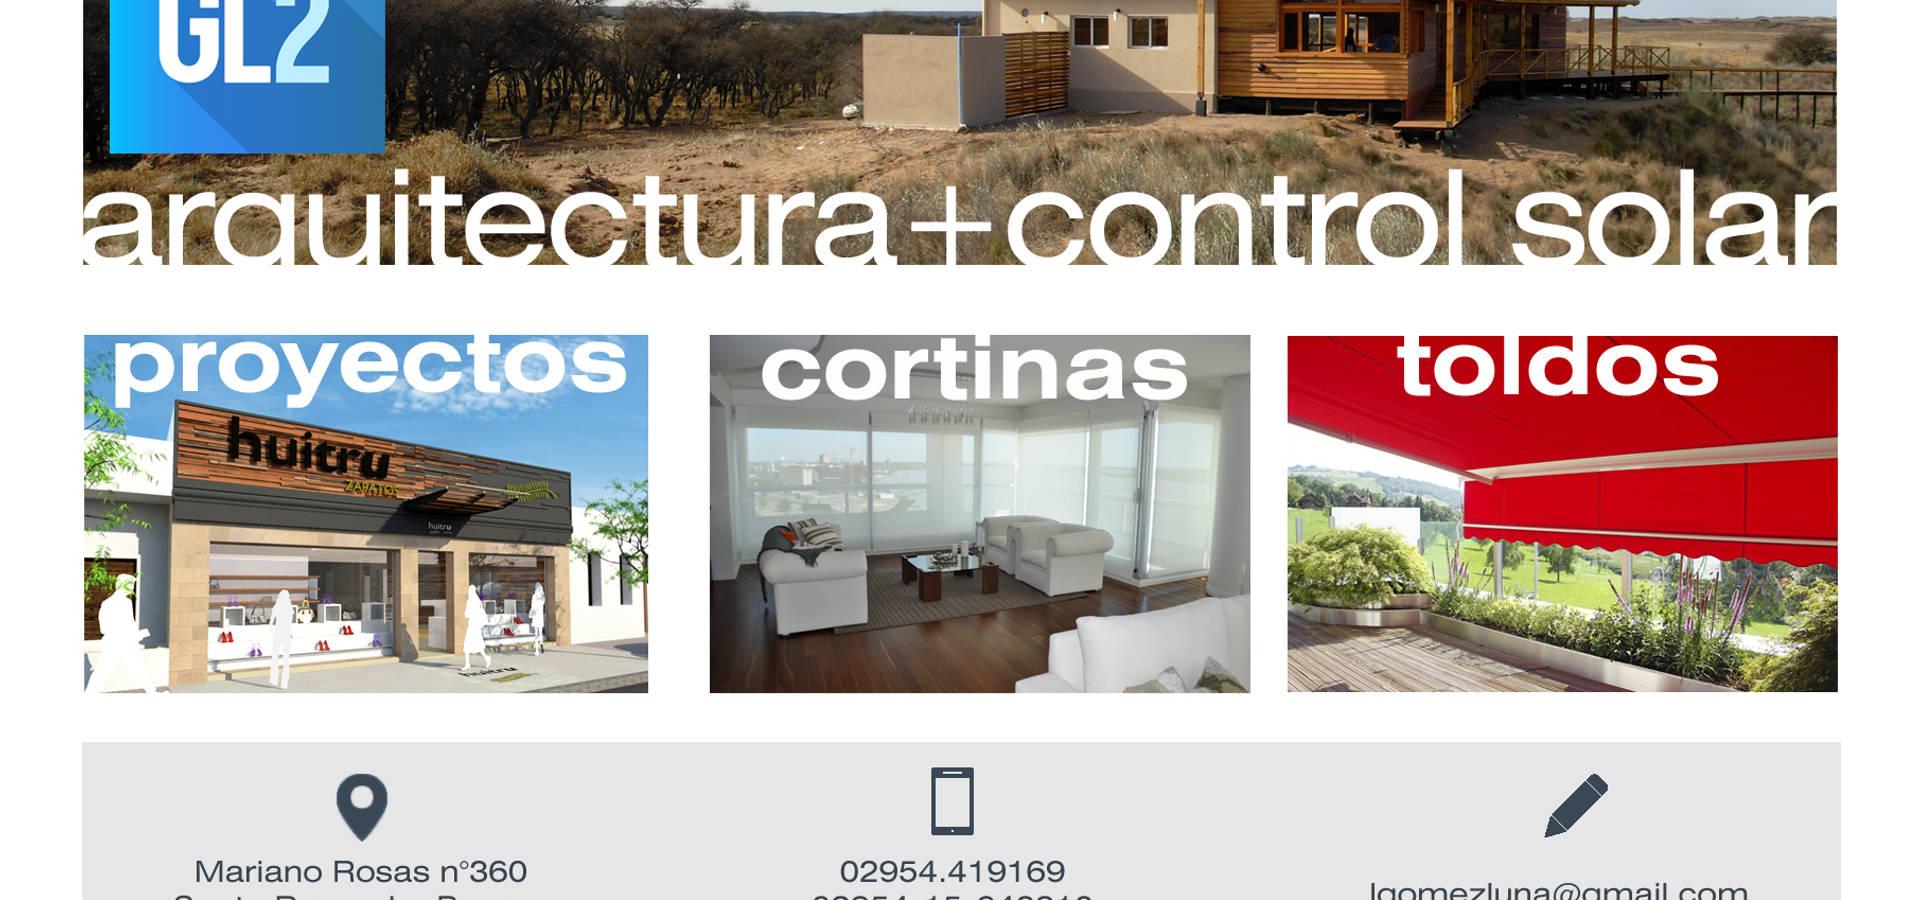 GL2 Arquitectura y Control Solar